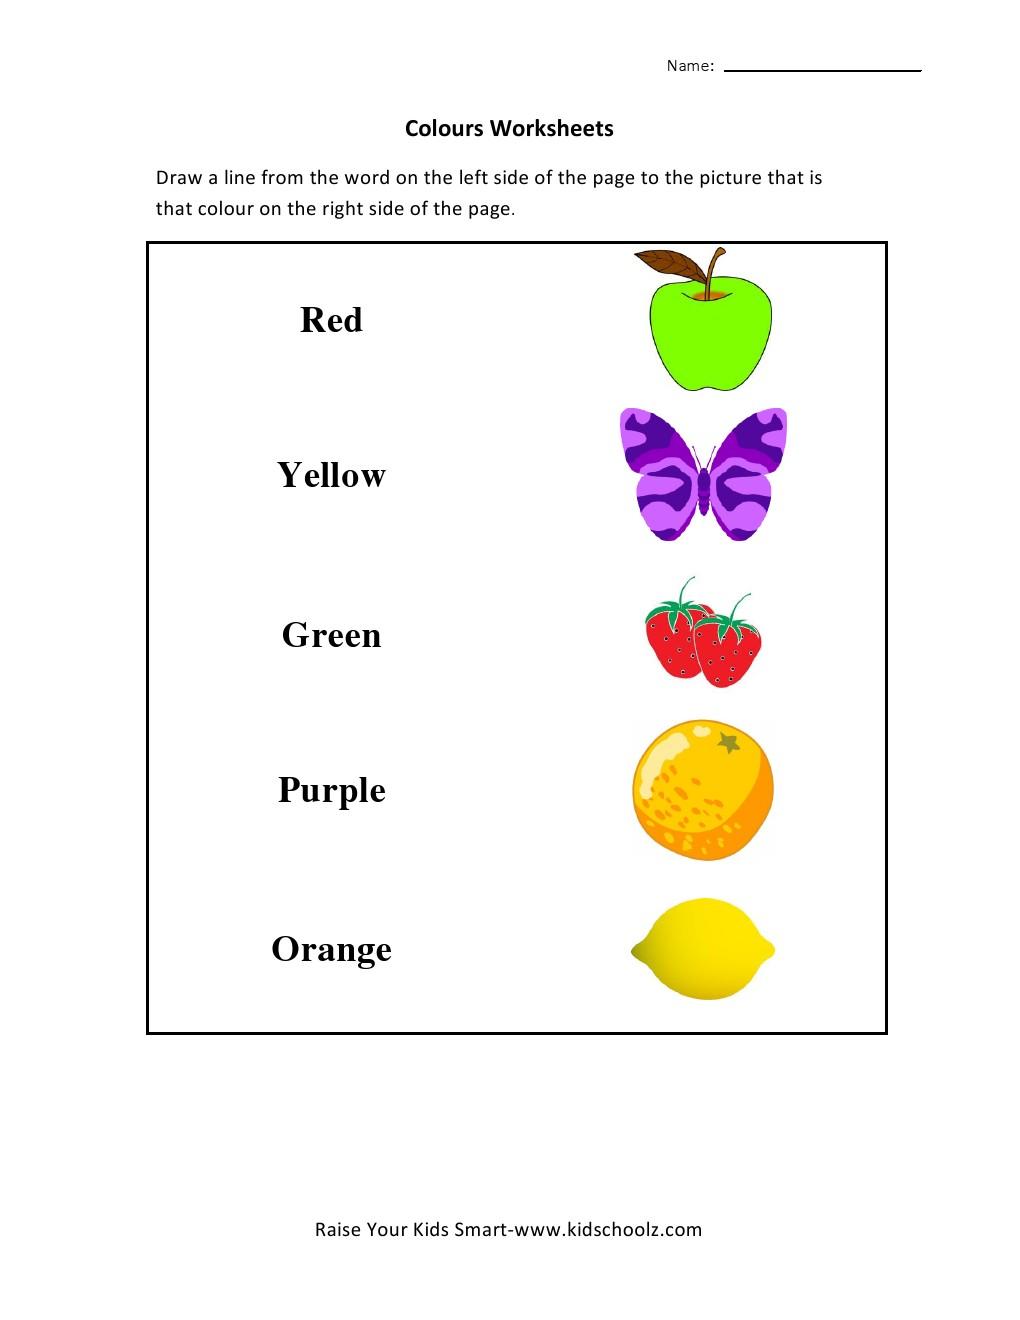 Colours Matching Worksheet - Kidschoolz